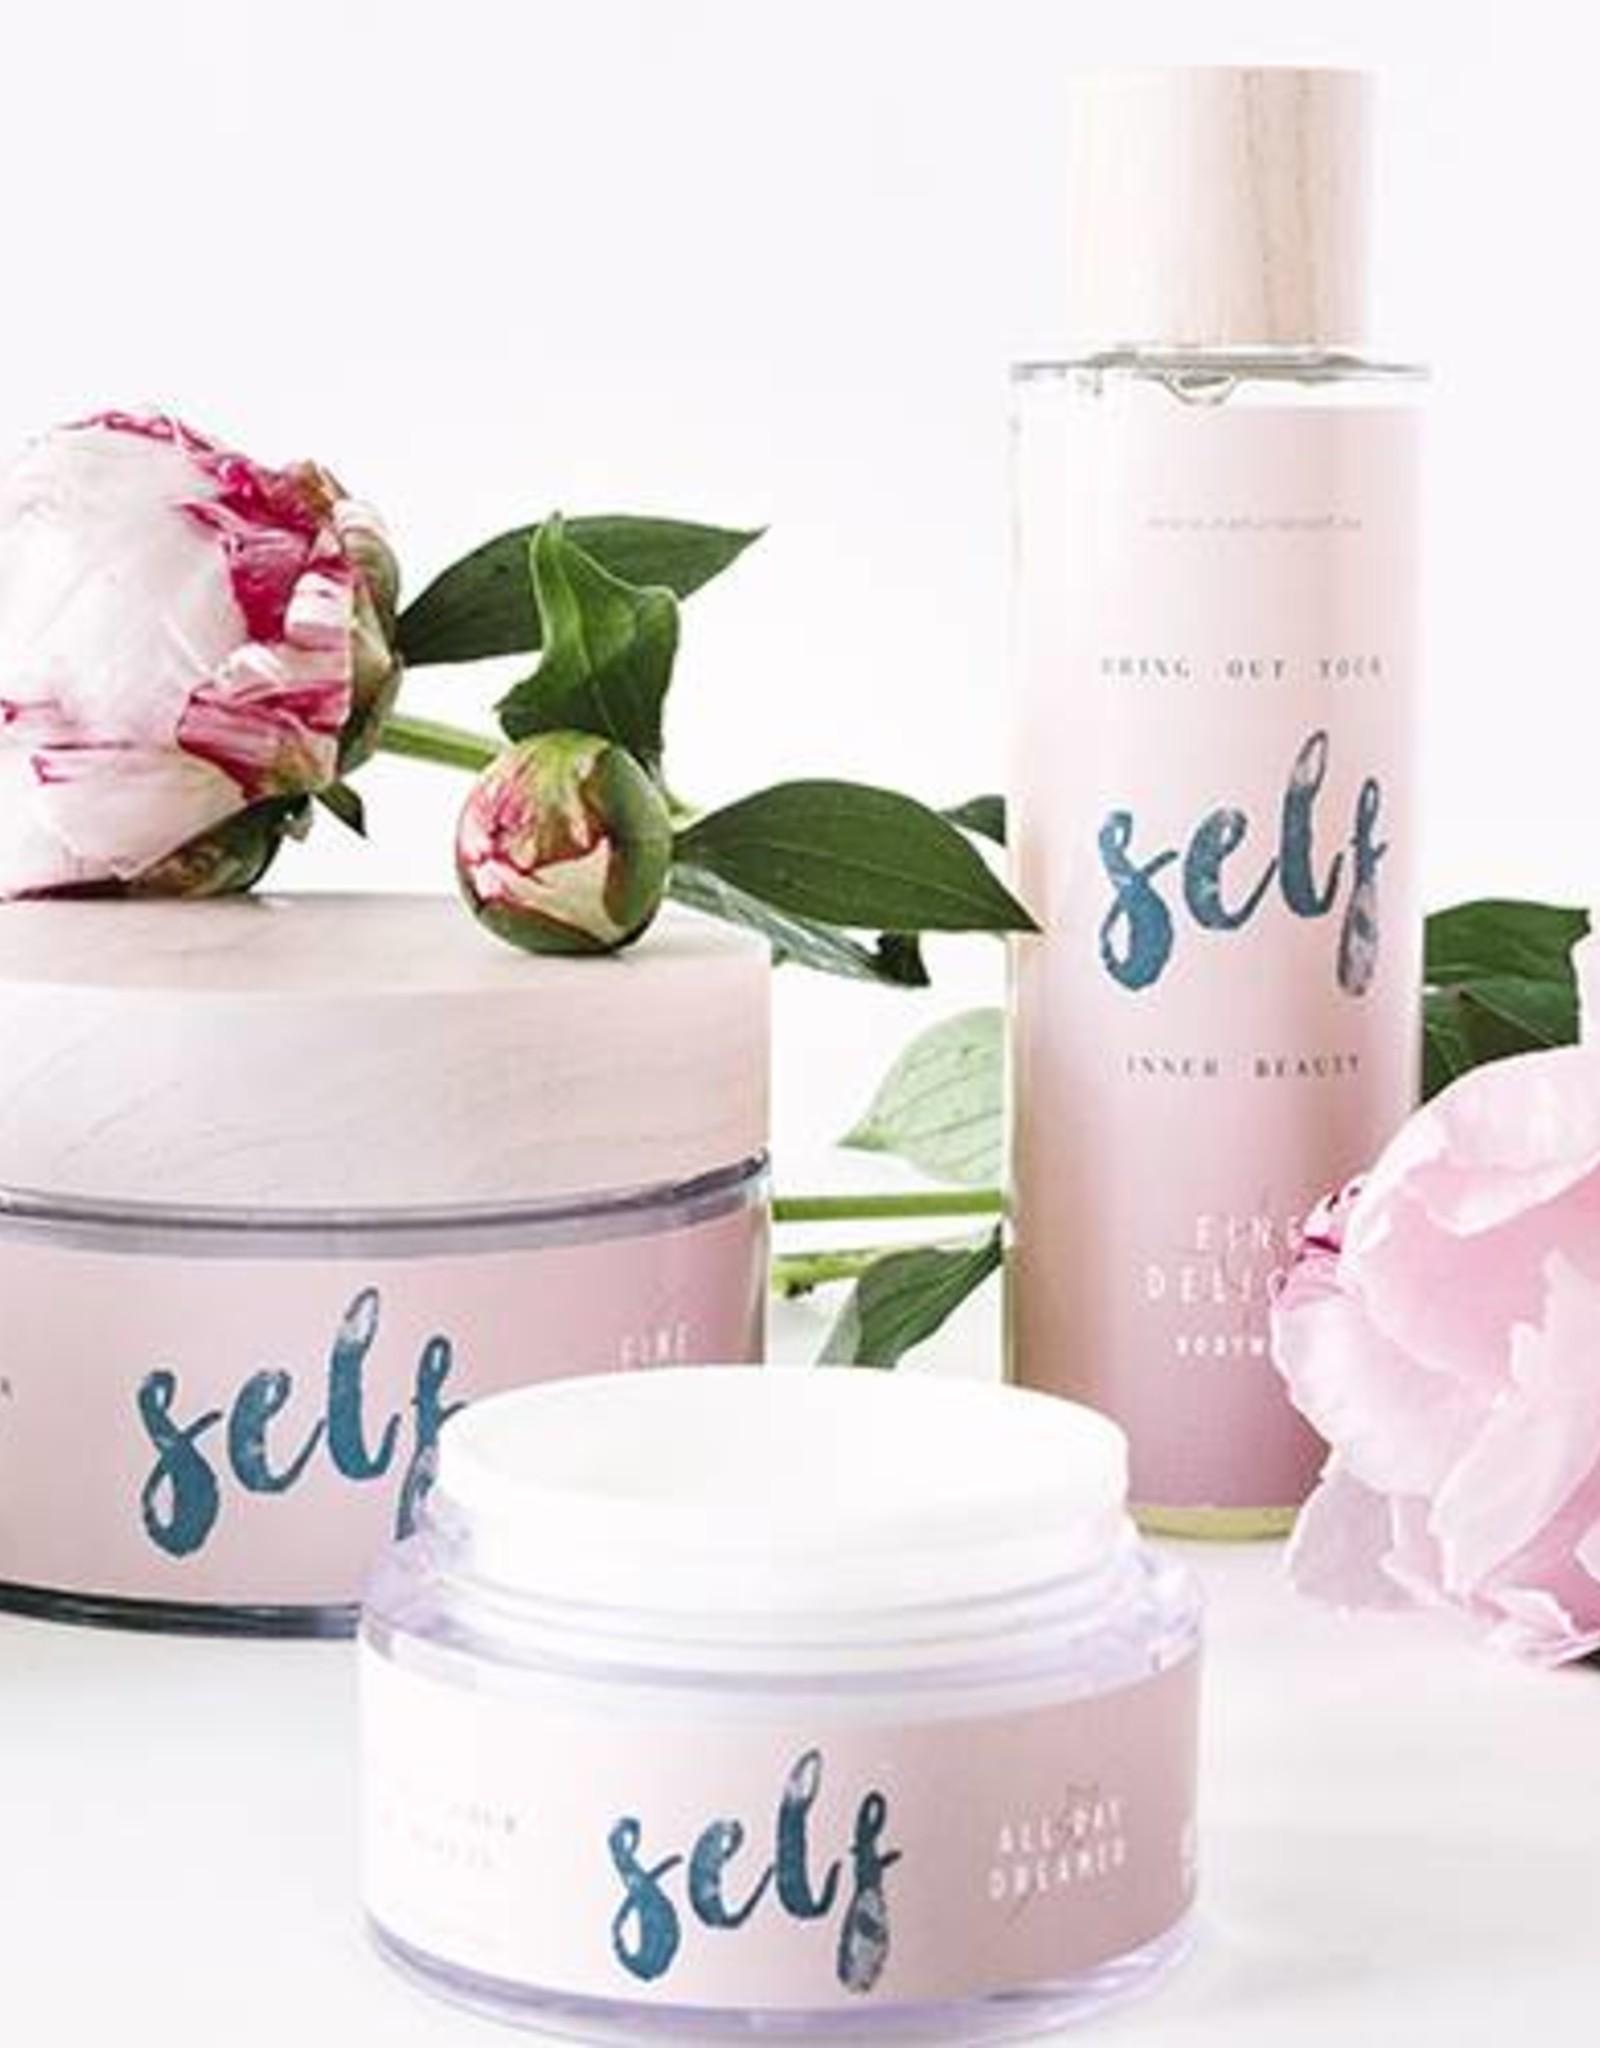 Self Self- Body scrub